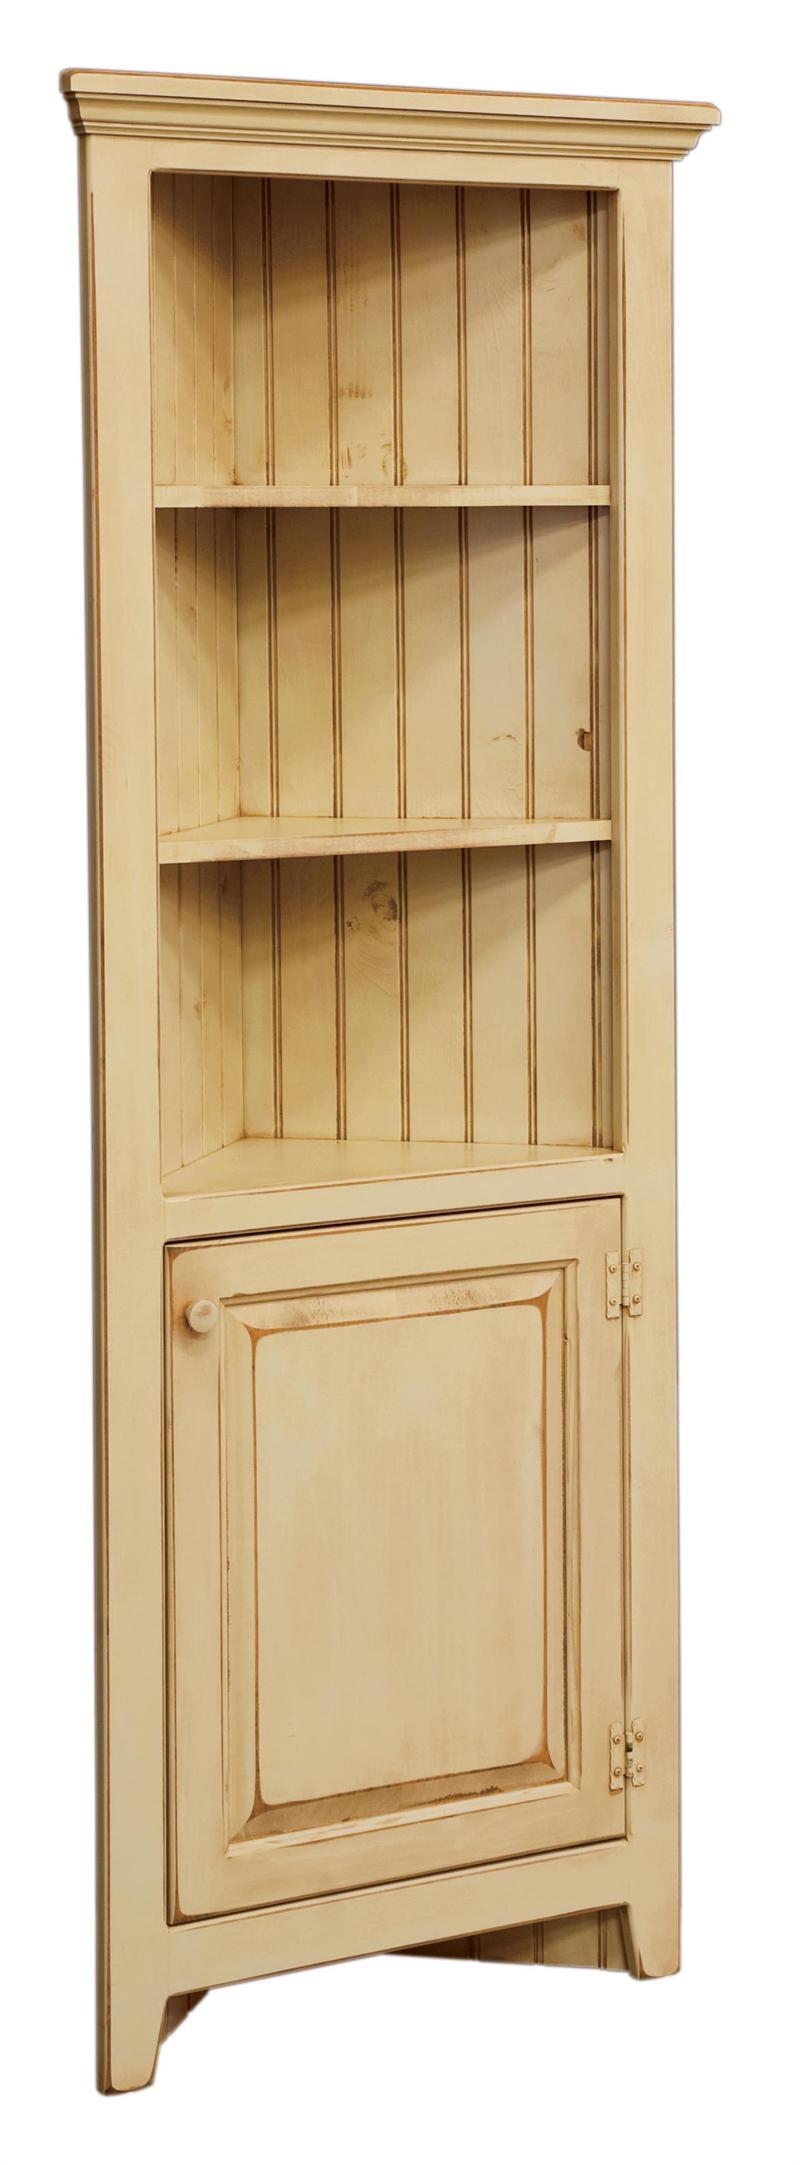 Corner kitchen pantry cabinet Photo - 11